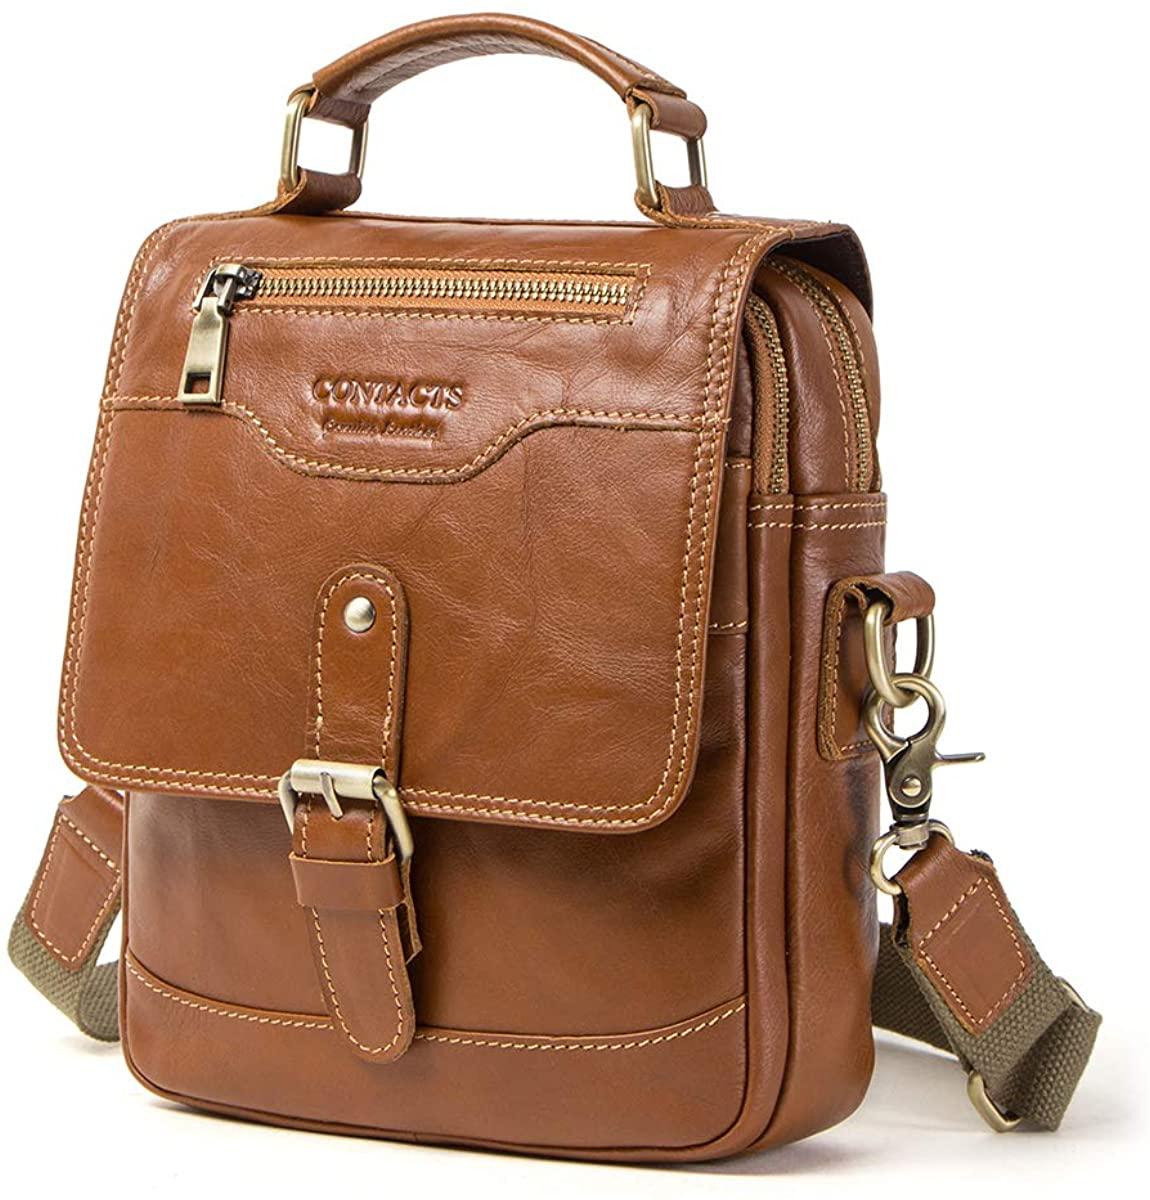 Contacts Genuine Leather Mens College School Travel Messenger Crossbody Shoulder Bag